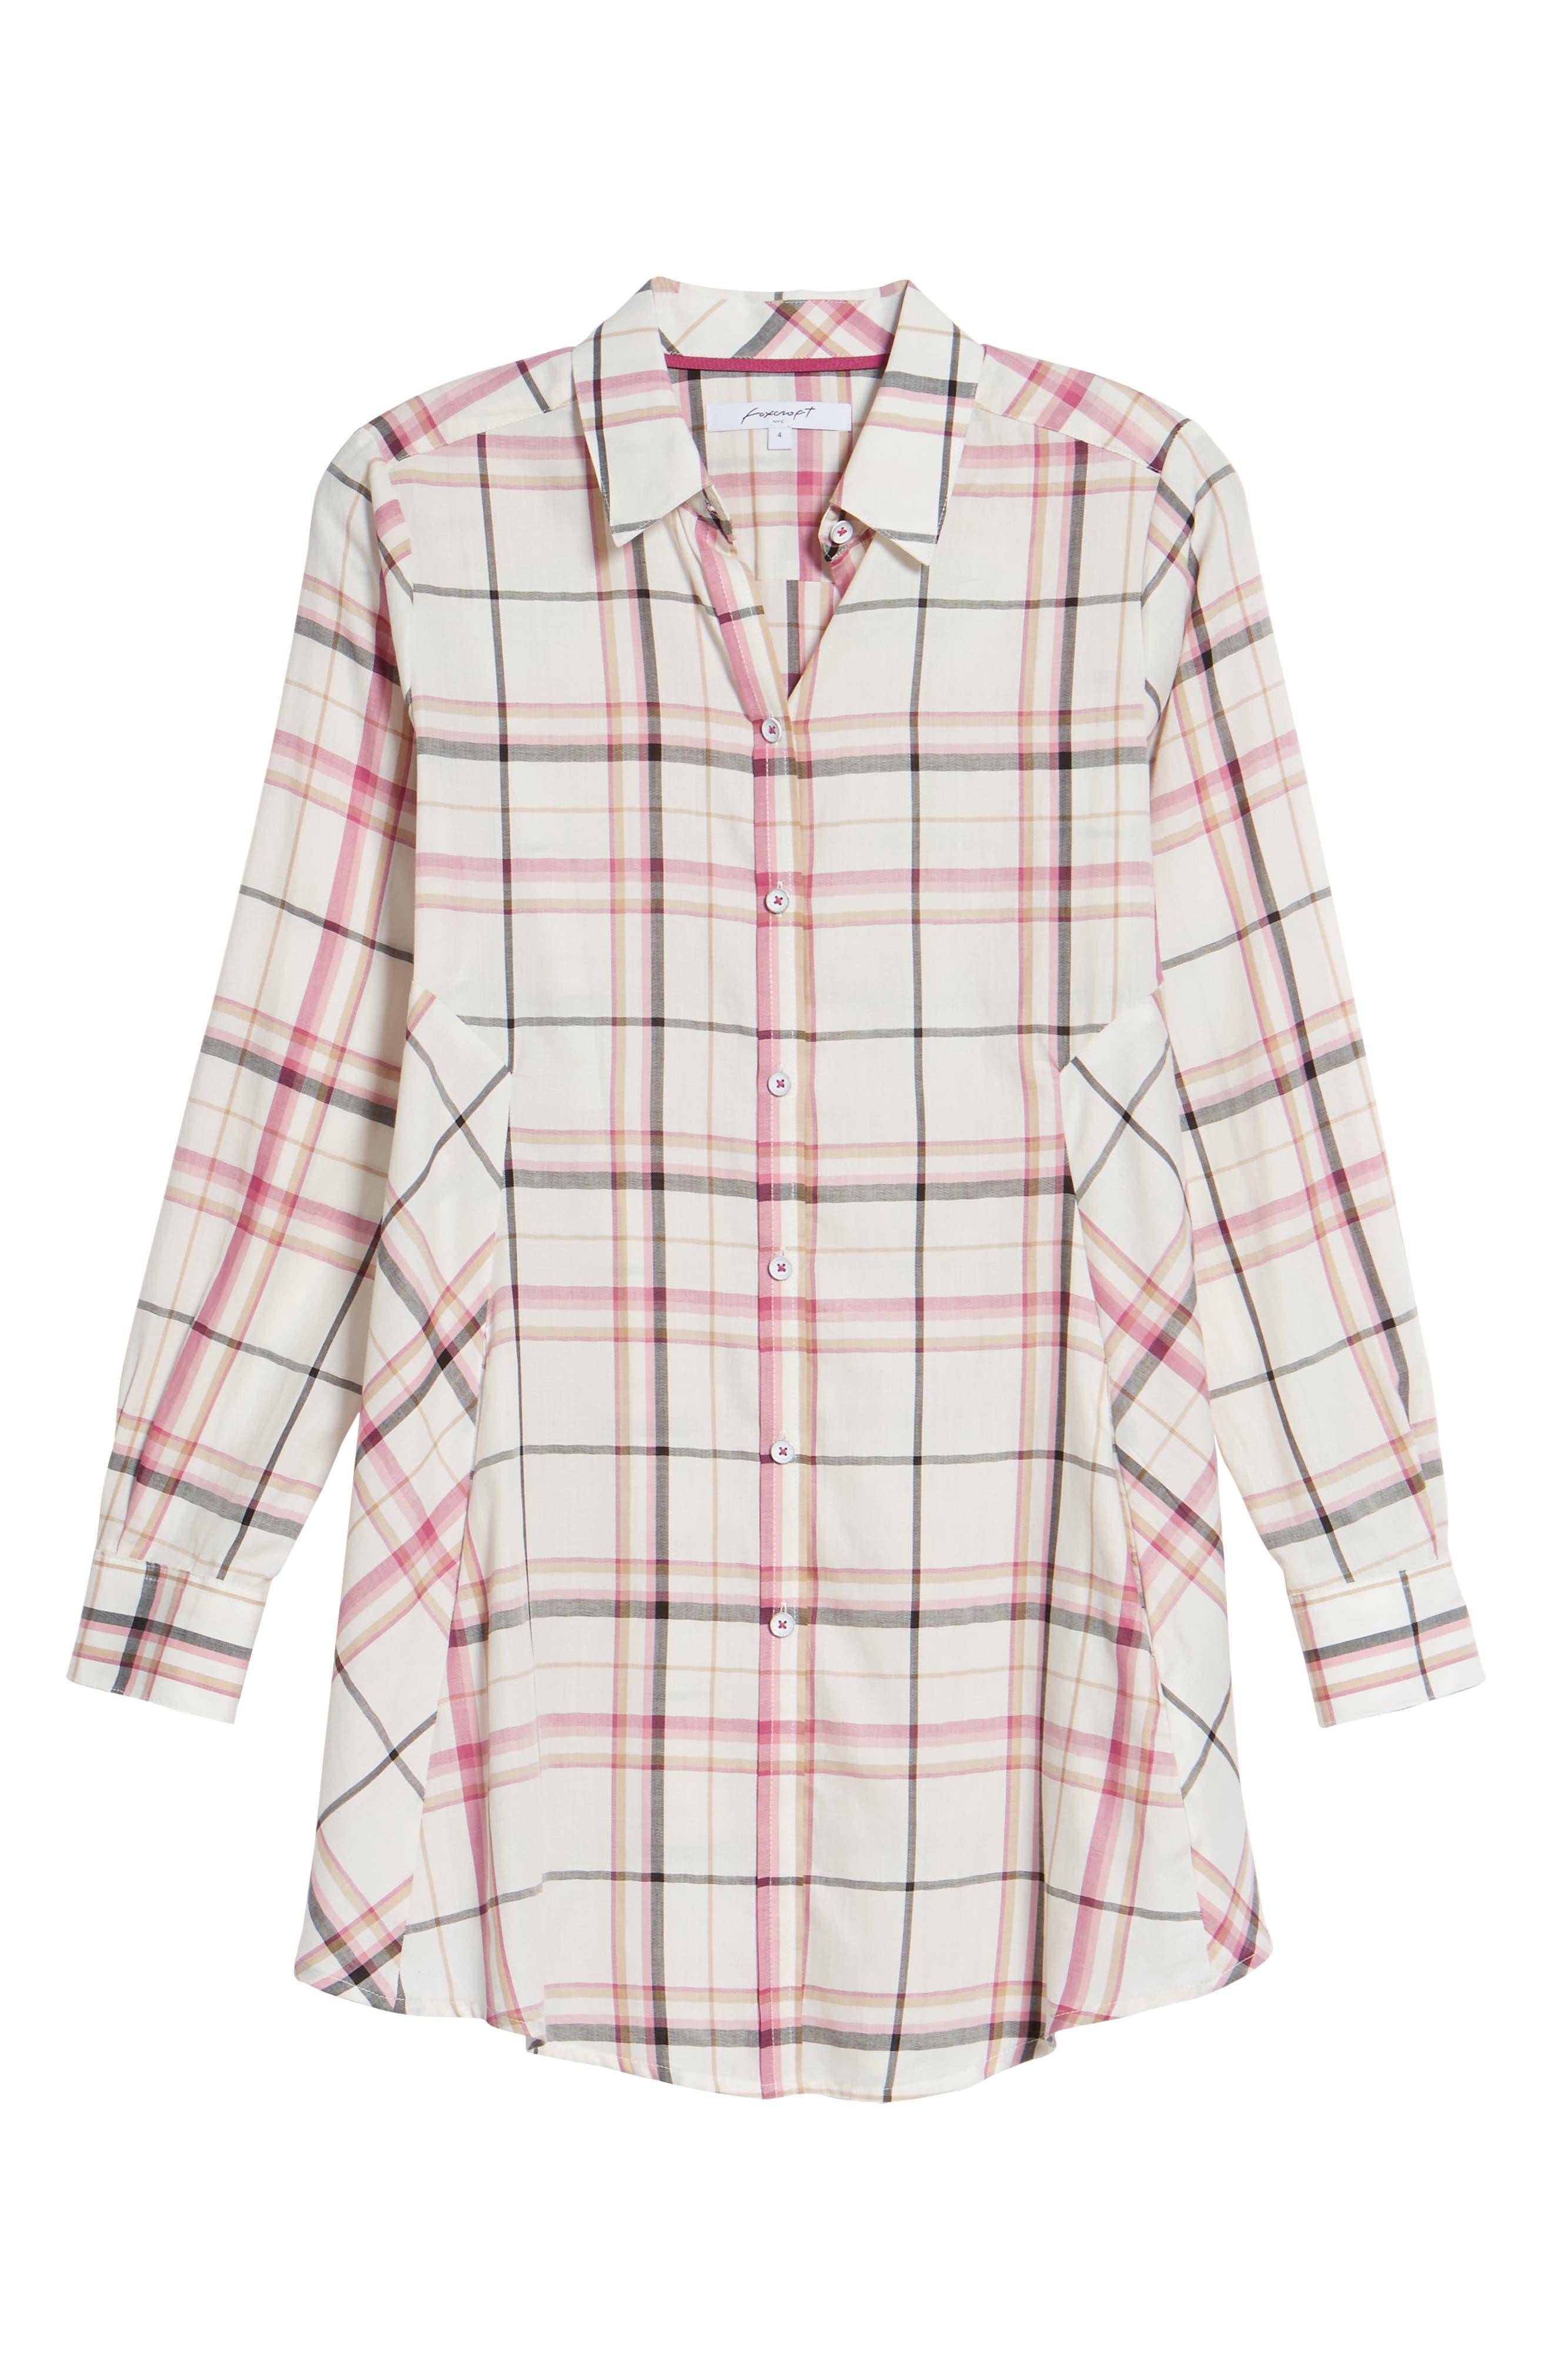 Cici Plaid Shirt,                             Main thumbnail 1, color,                             Roseberry Plaid